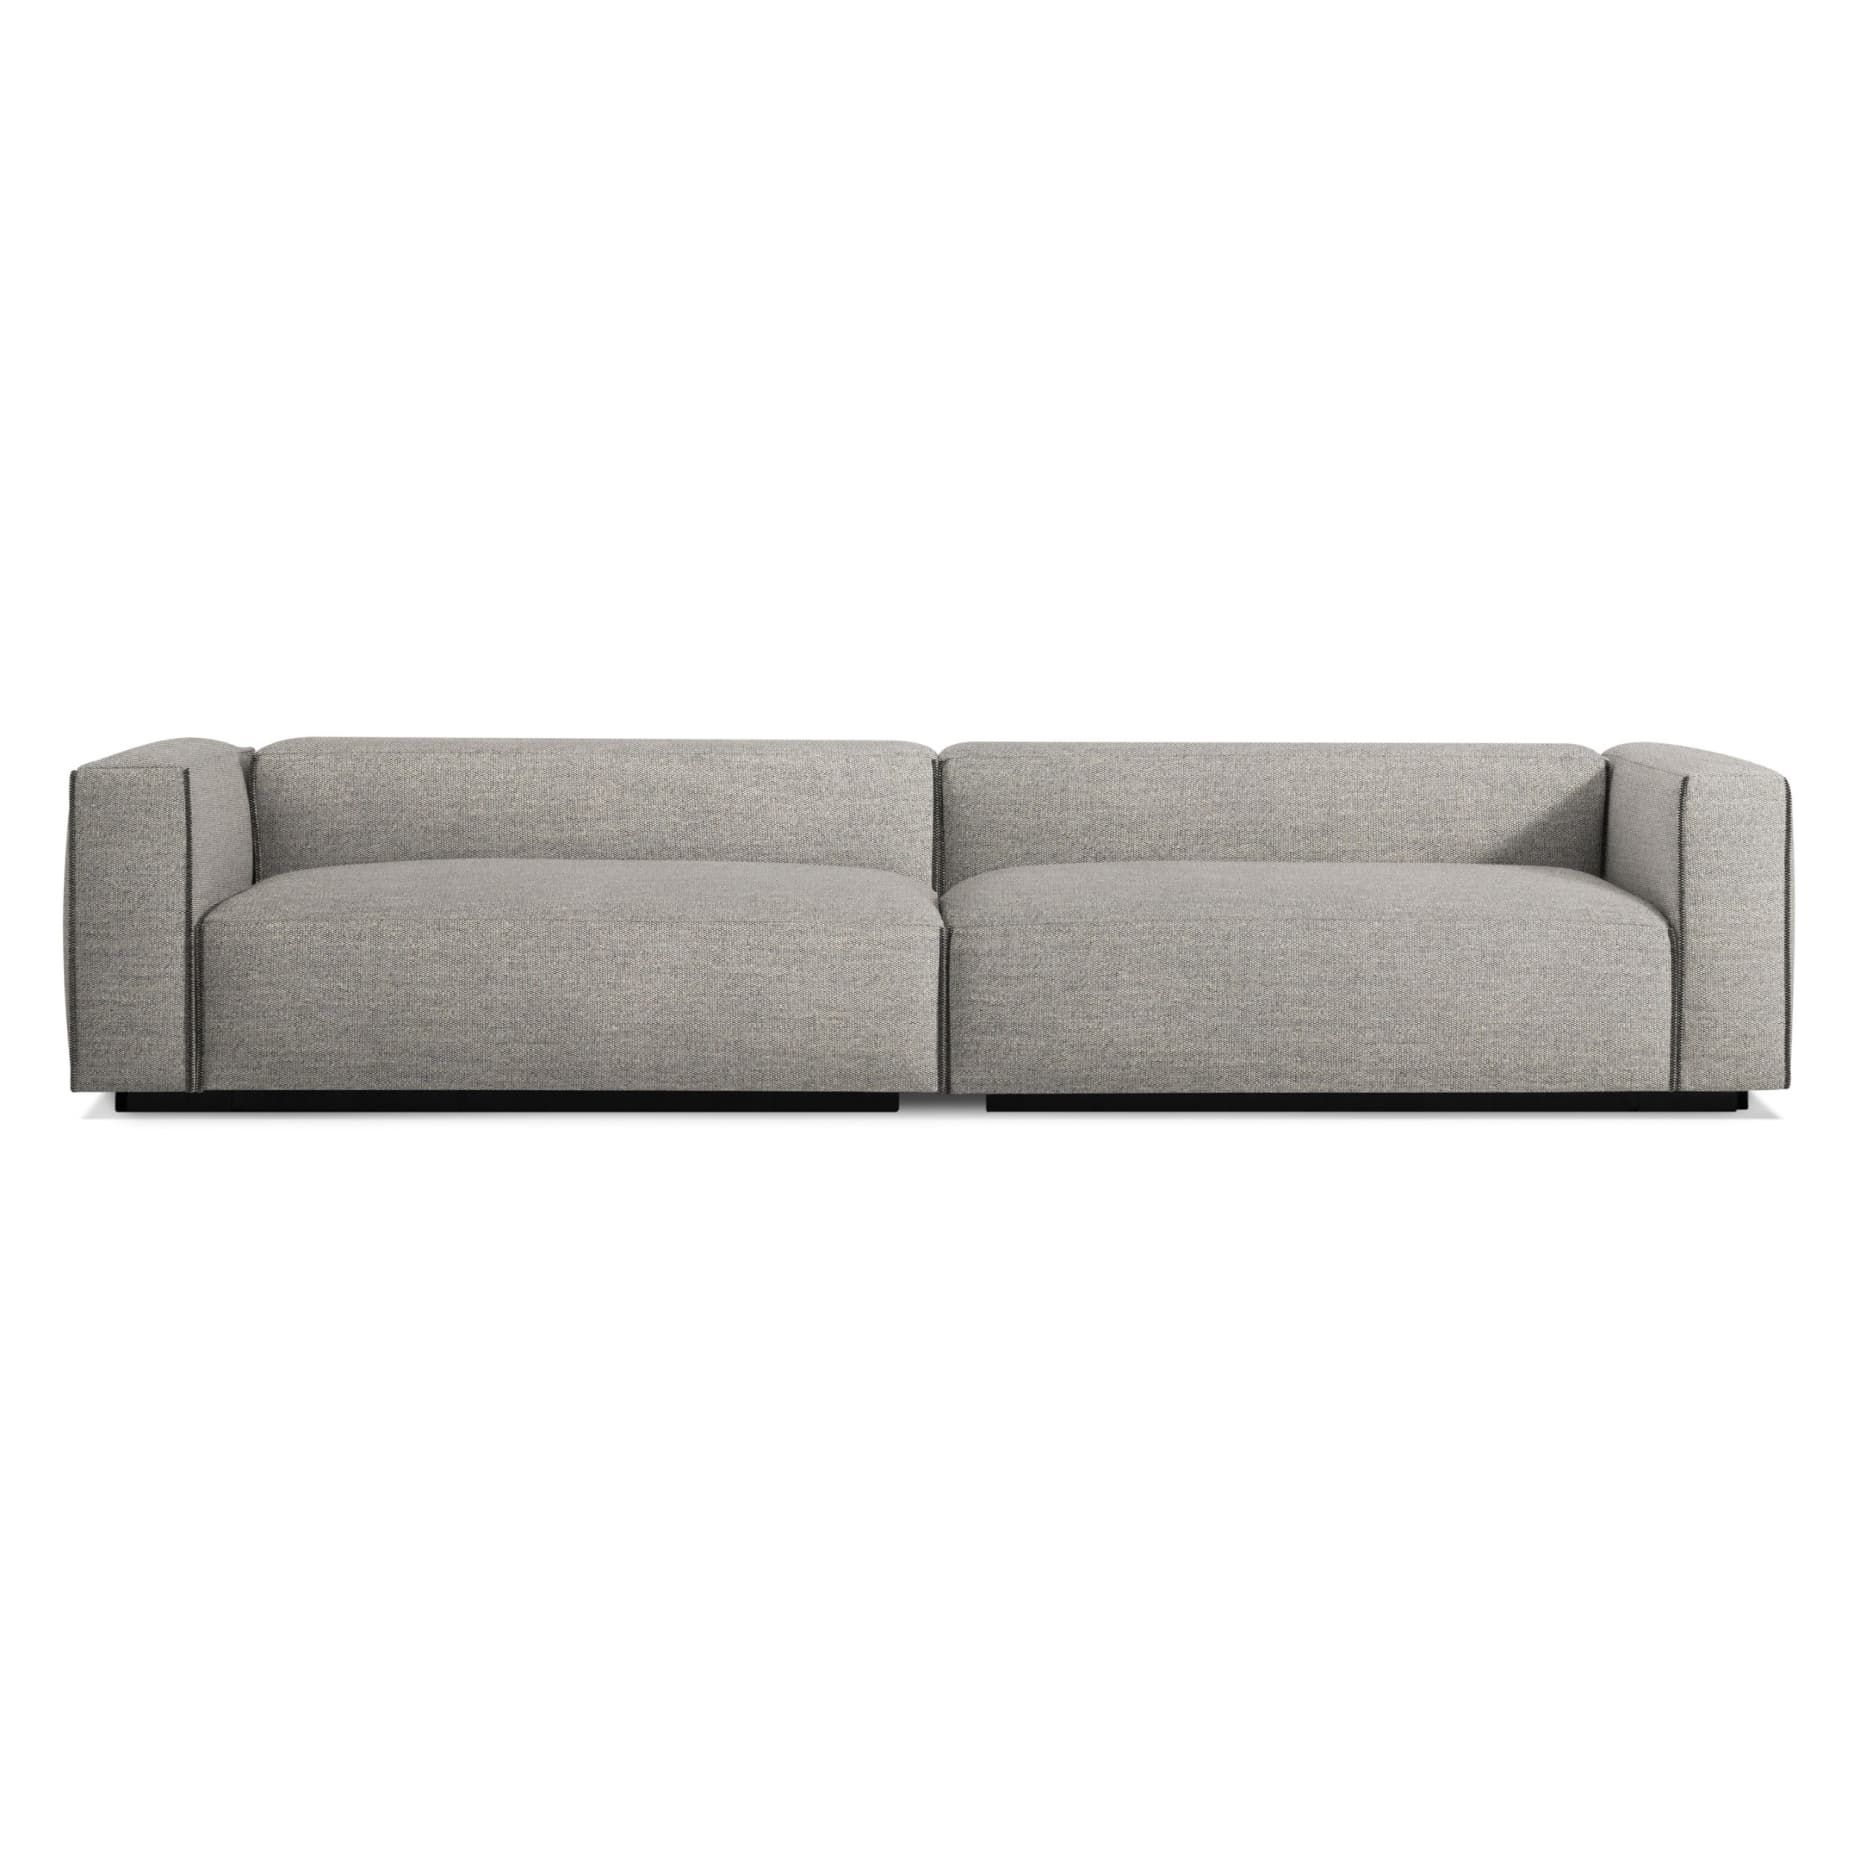 Cleon Small Sectional Sofa Small Sectional Sofa Sectional Sofa